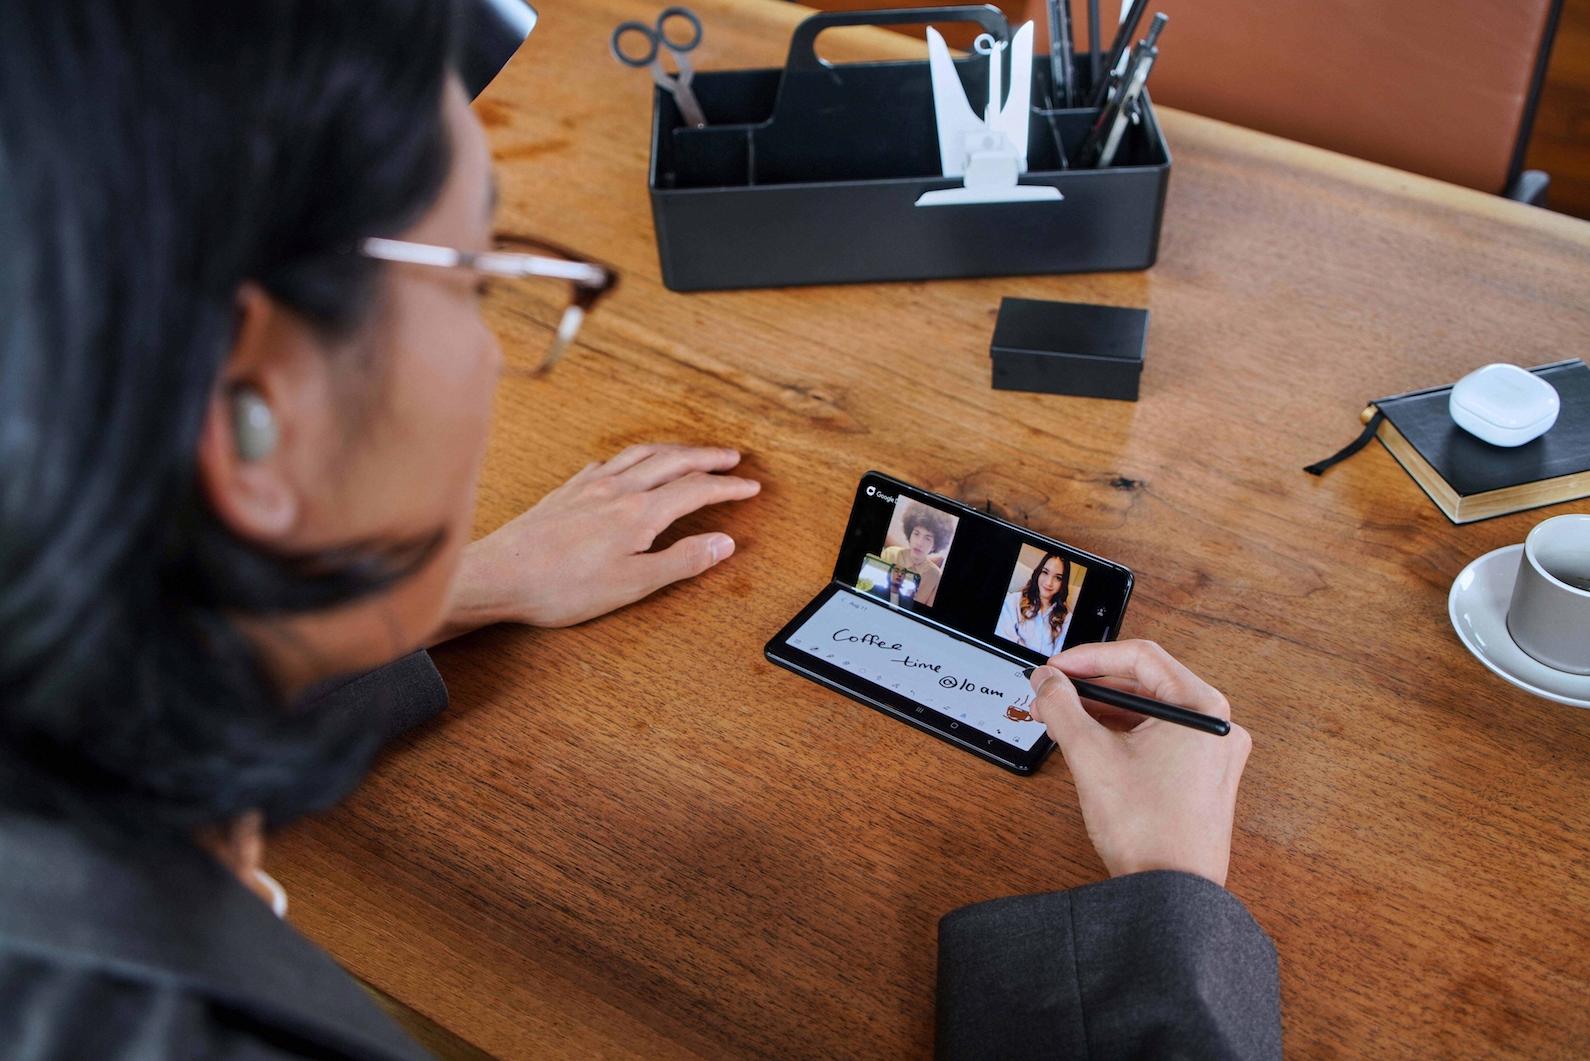 Samsung Galaxy Z Fold 3 with under-display camera